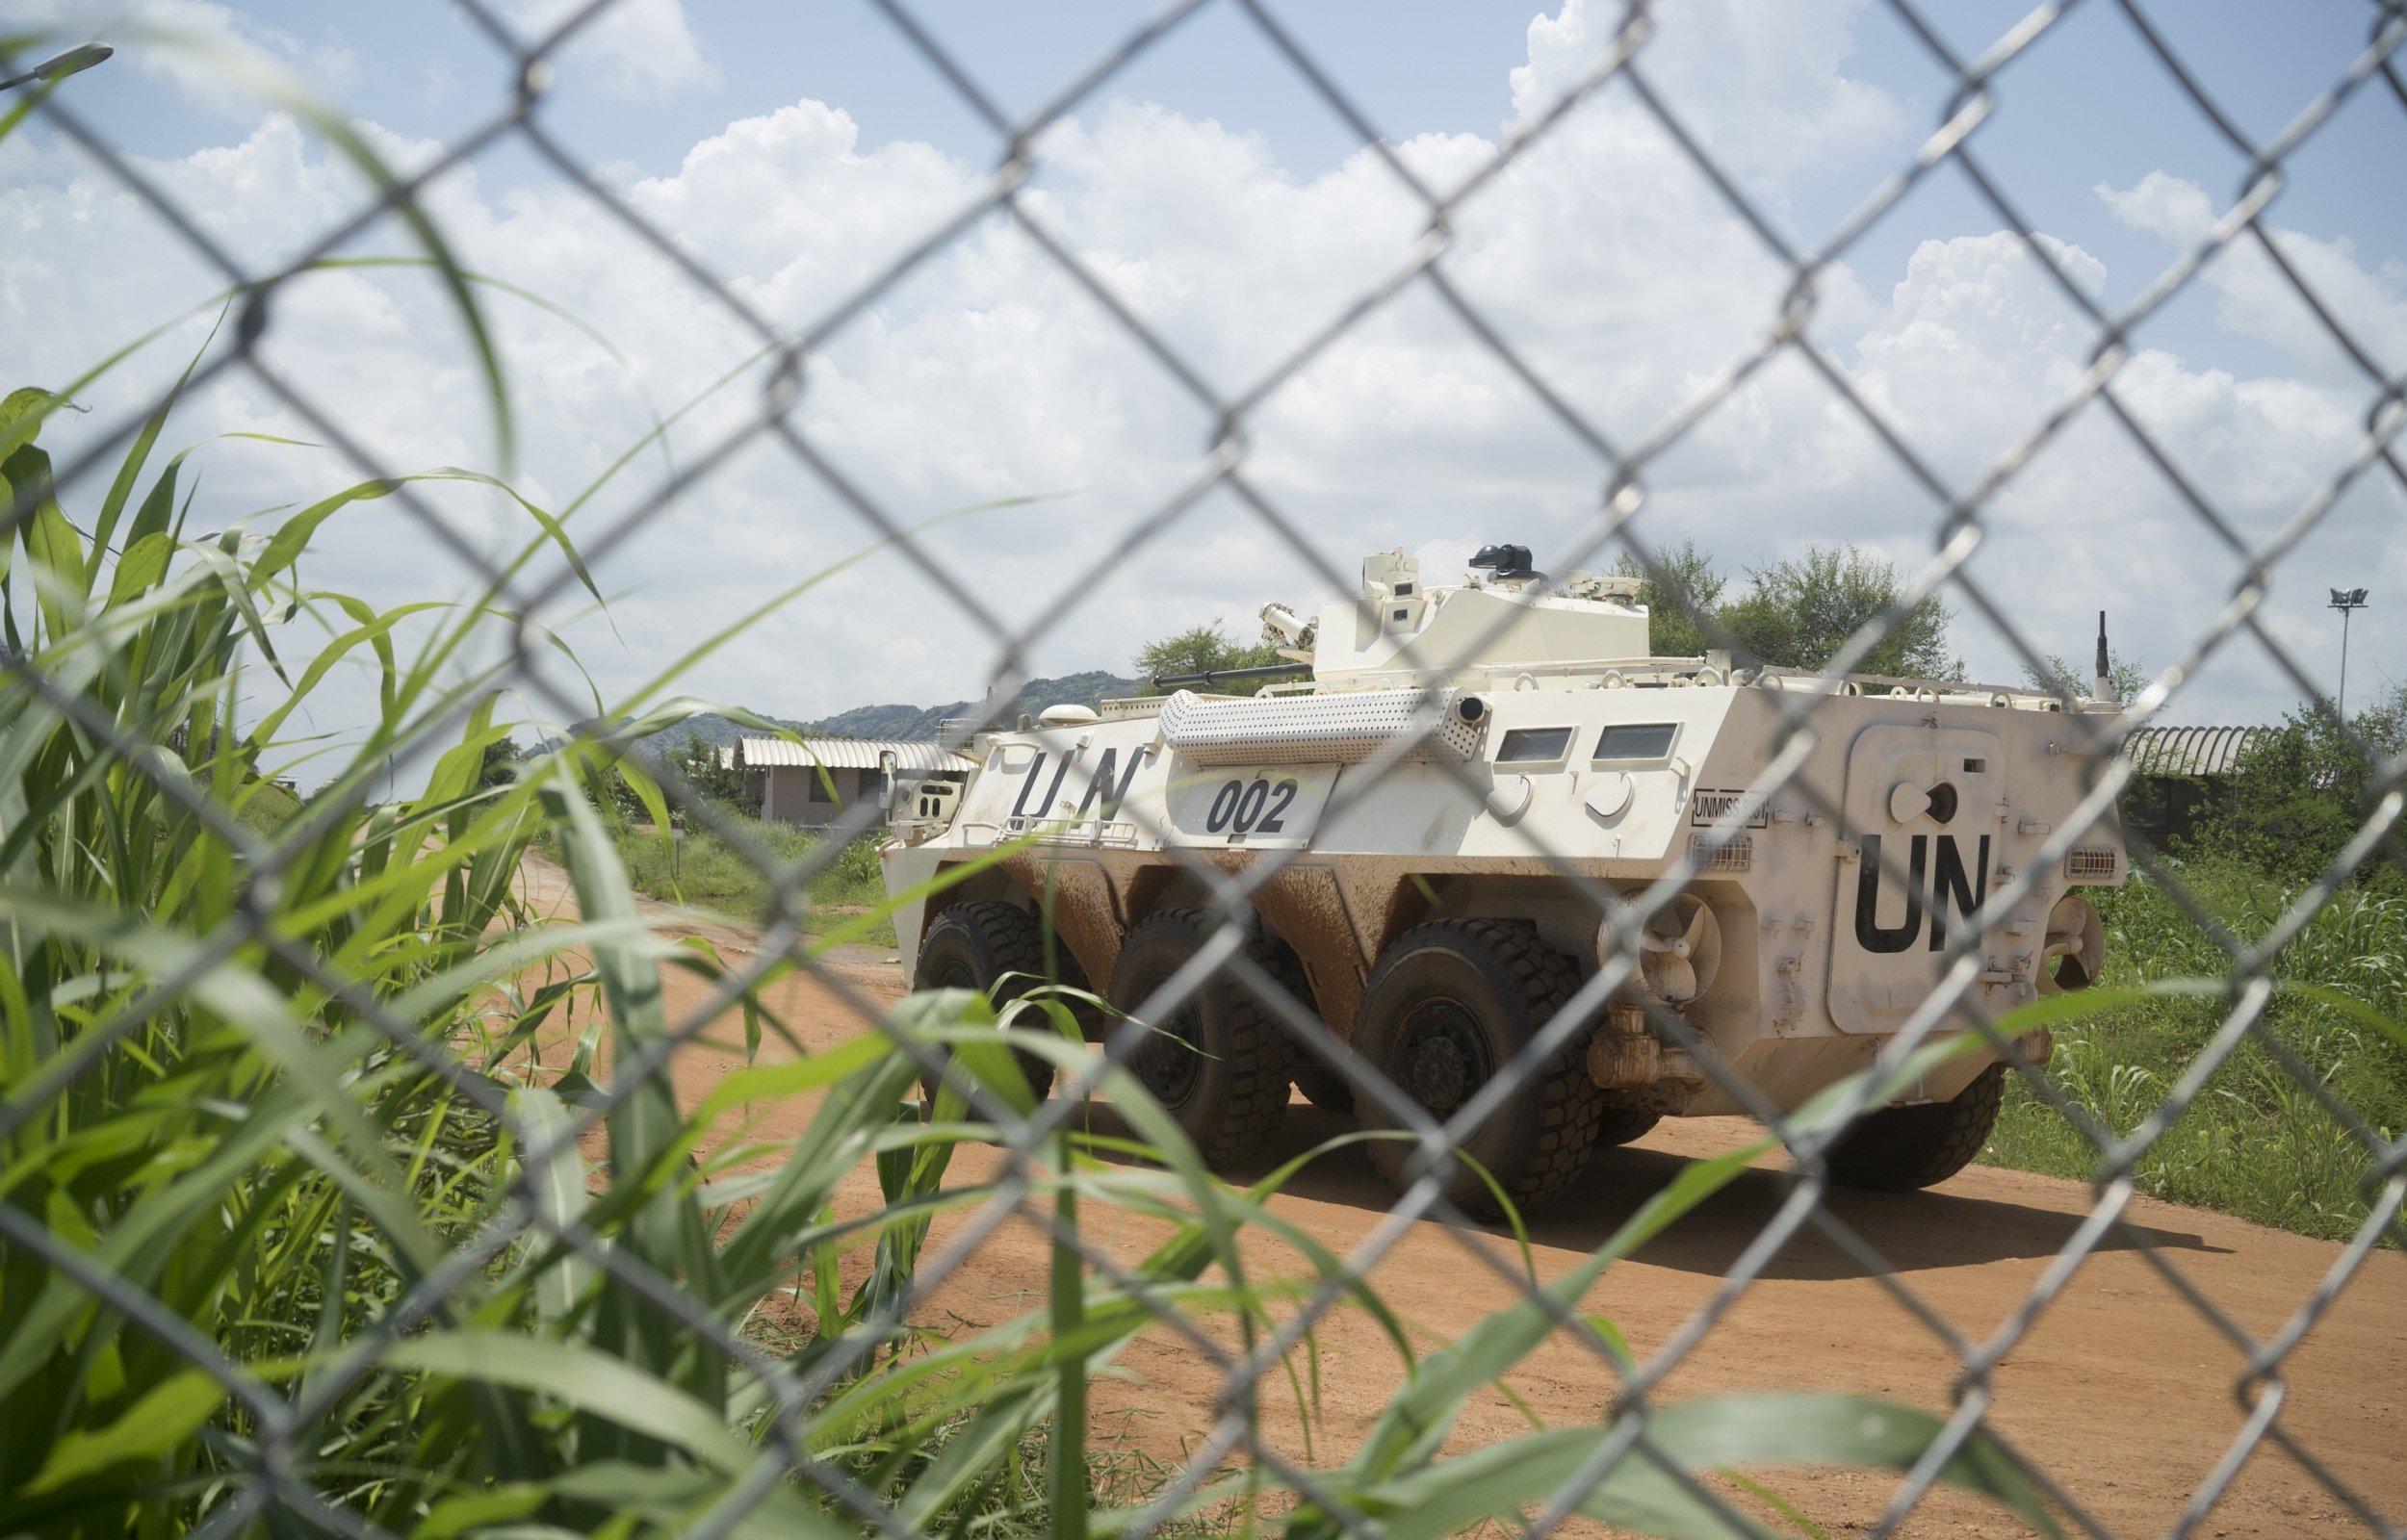 U.N. armored personnel carrier in Juba